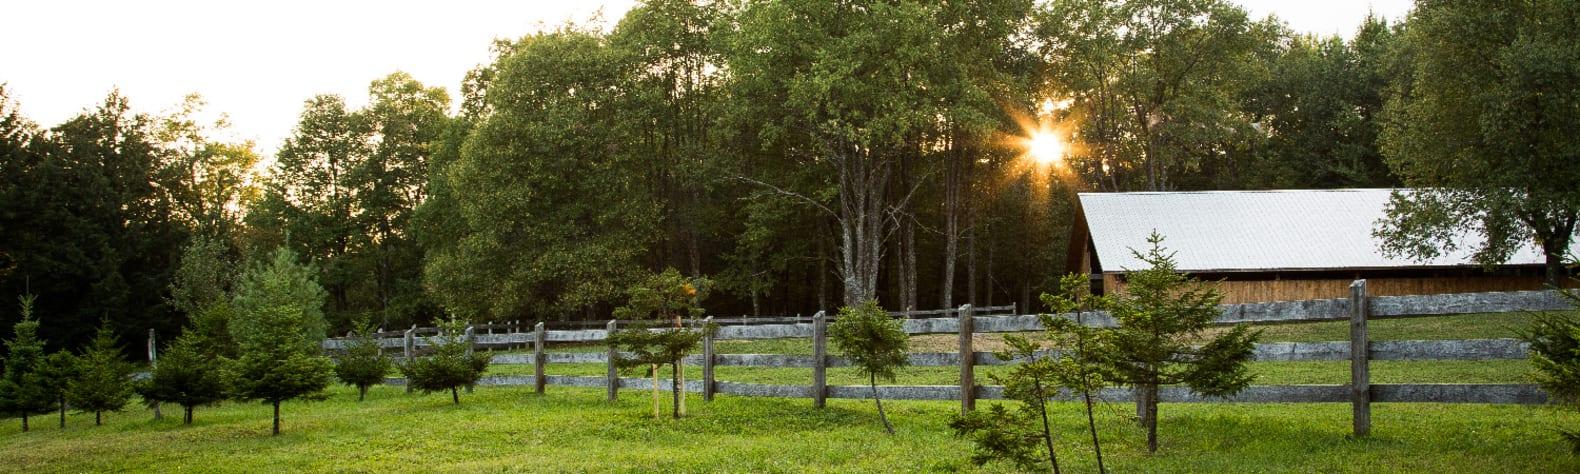 Trailside Ranch Cabin Rentals